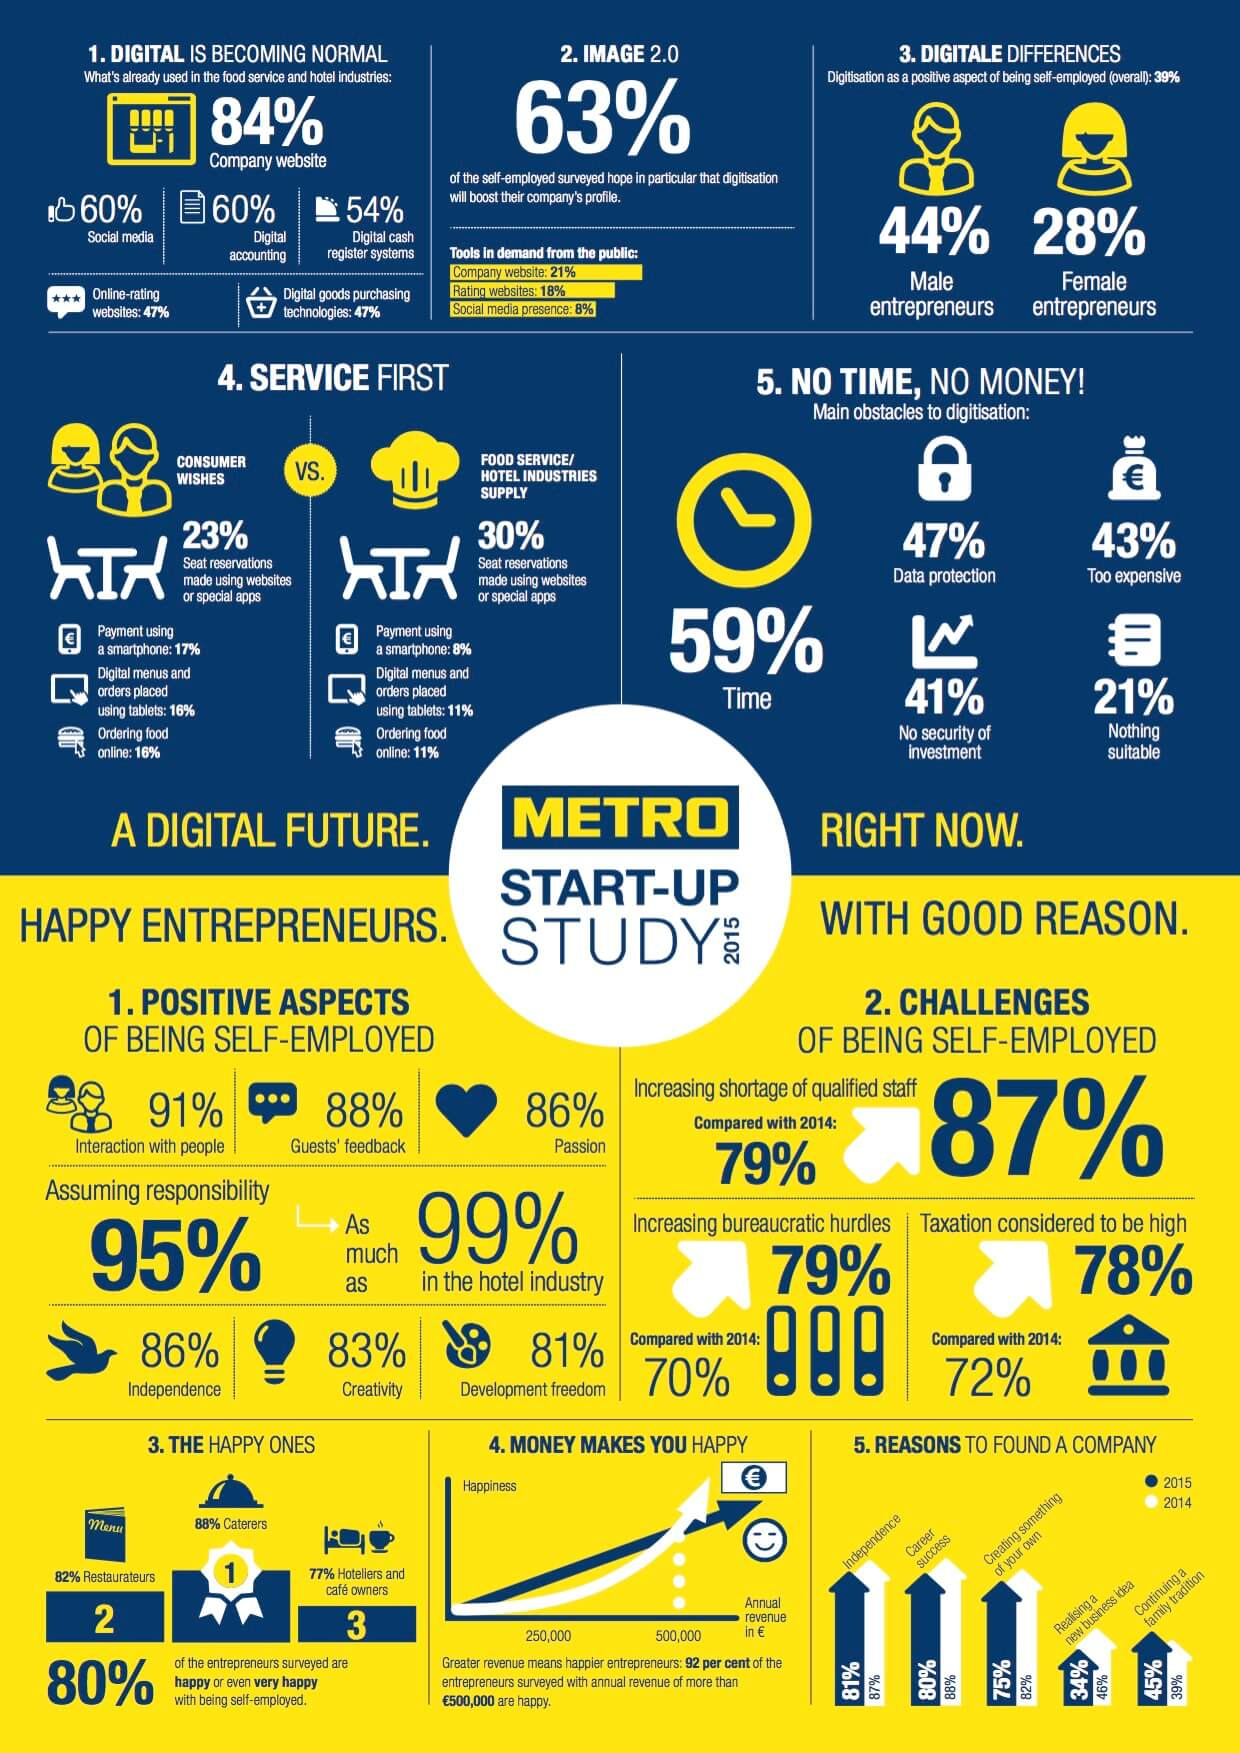 METRO Start-up Study 2015